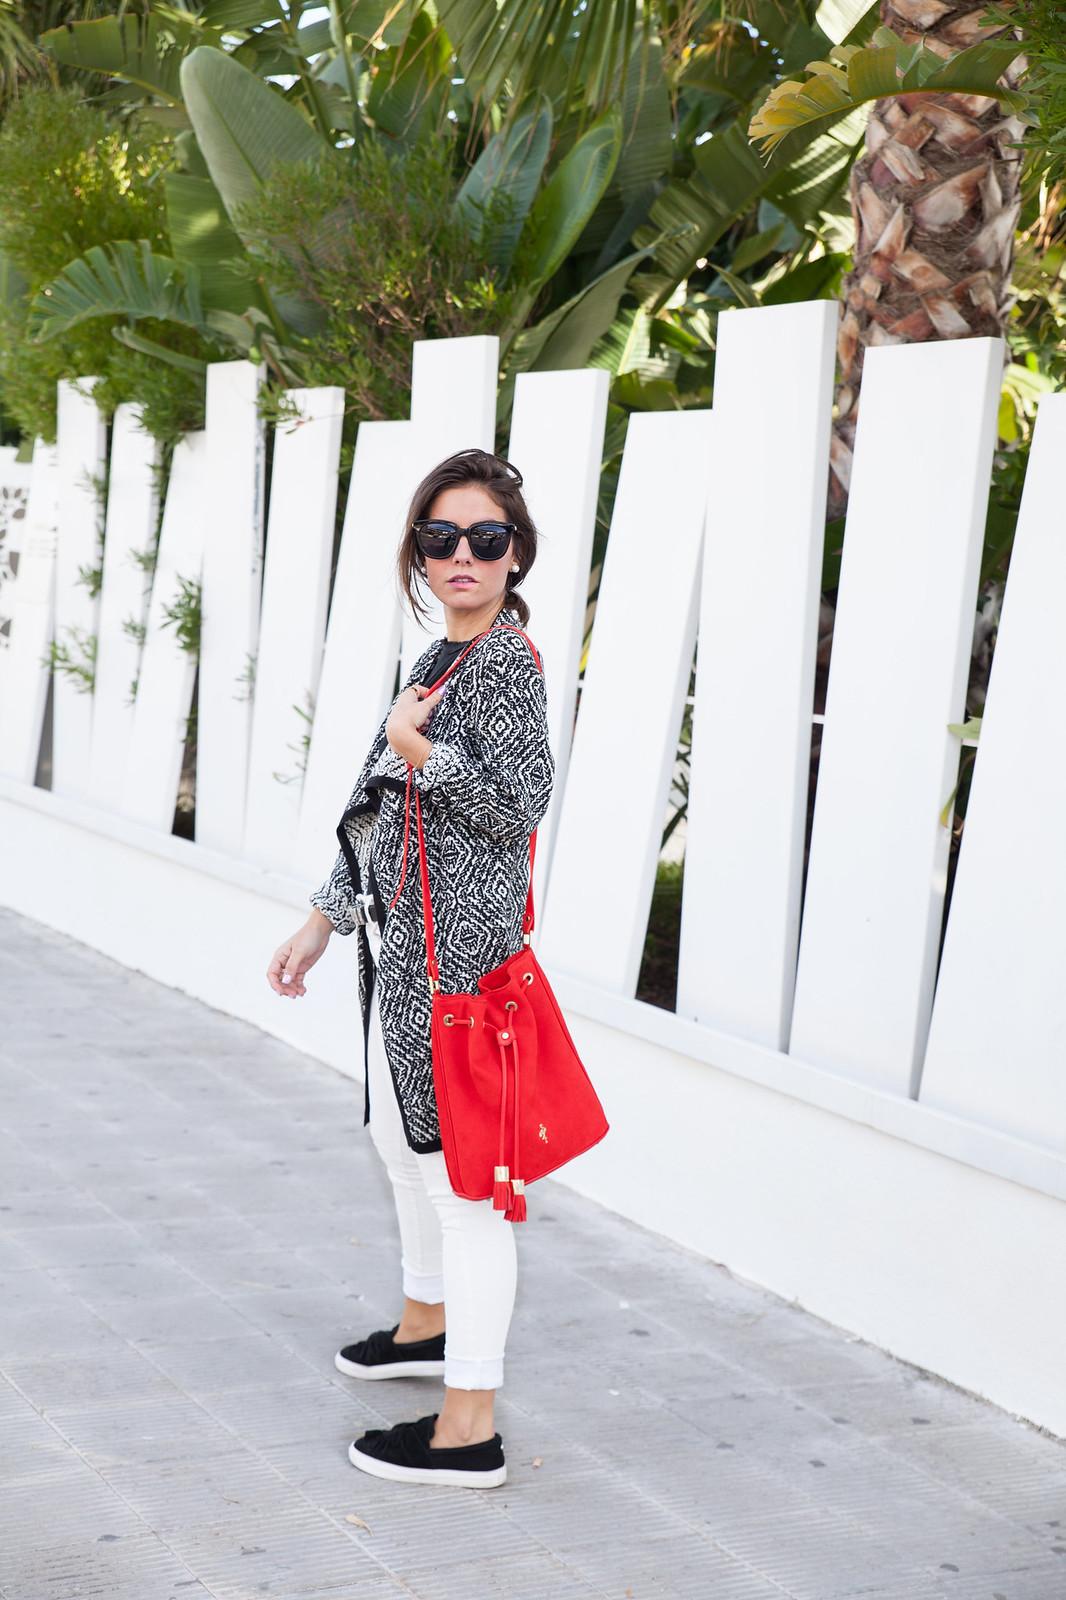 theguestgirl laura santolaria influencer barcelona spain bolso rojo